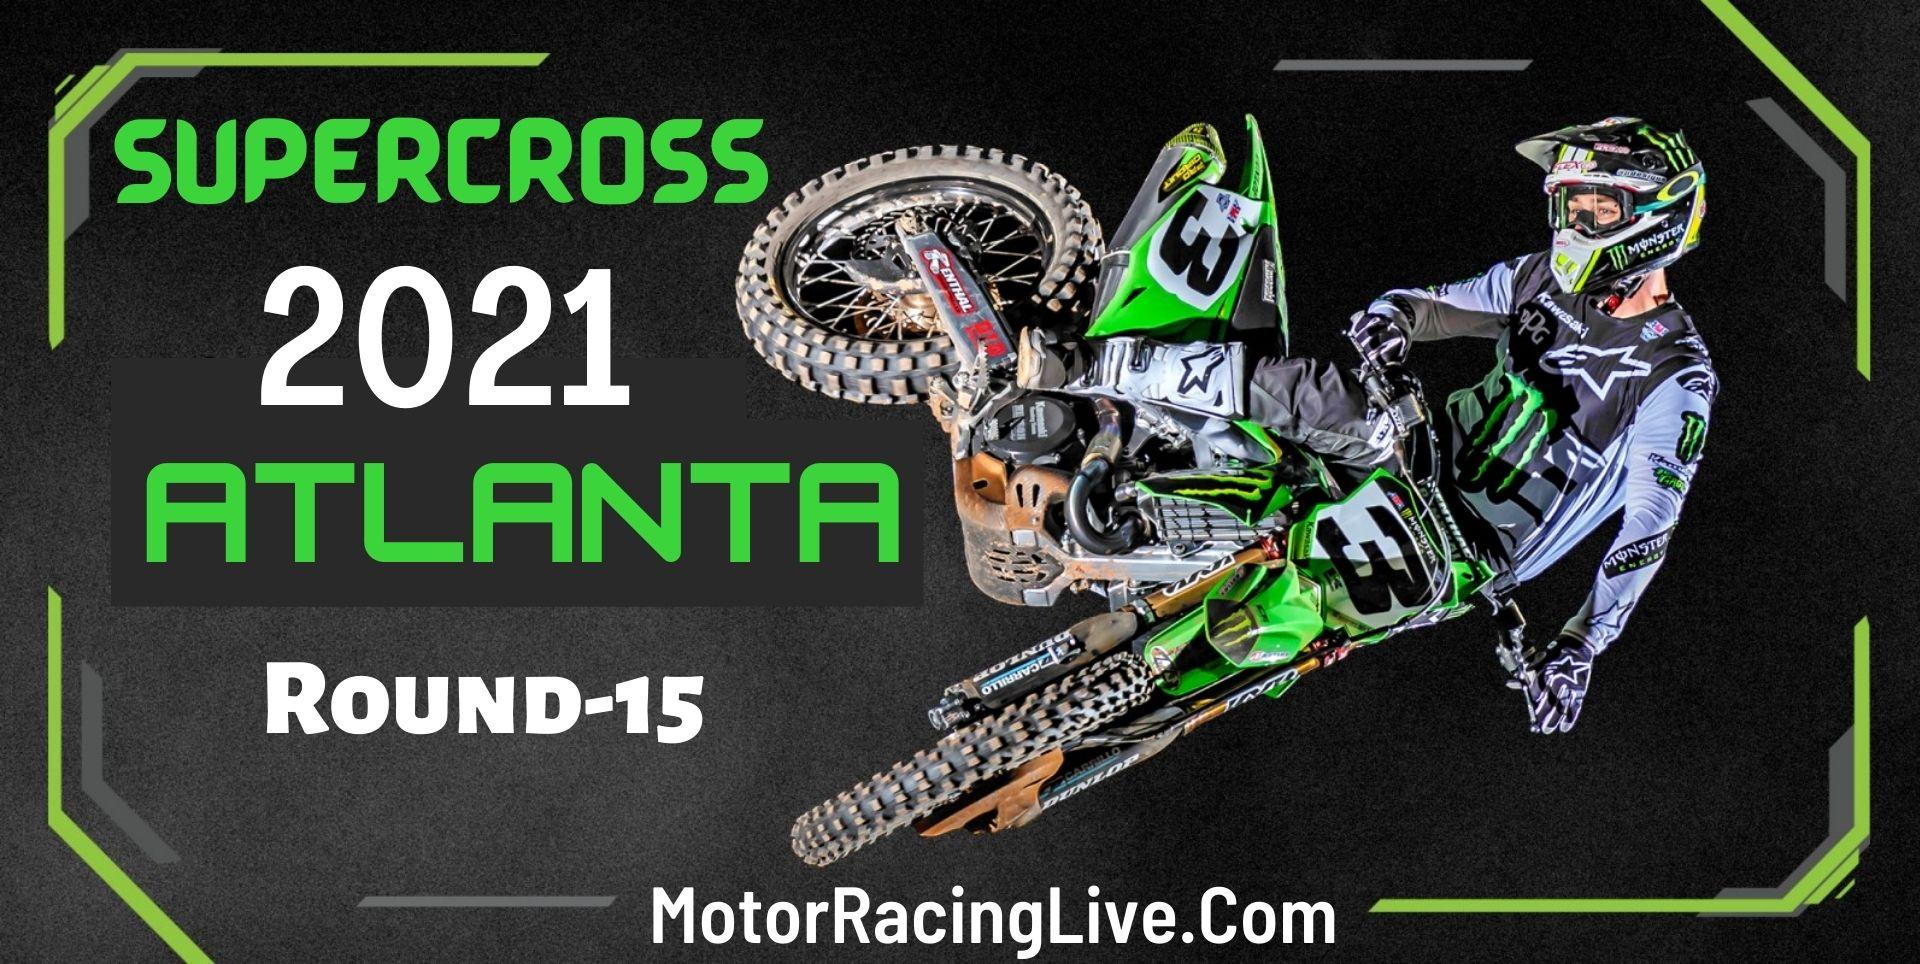 Supercross Atlanta Rd 15 Live 17-Apr 2021